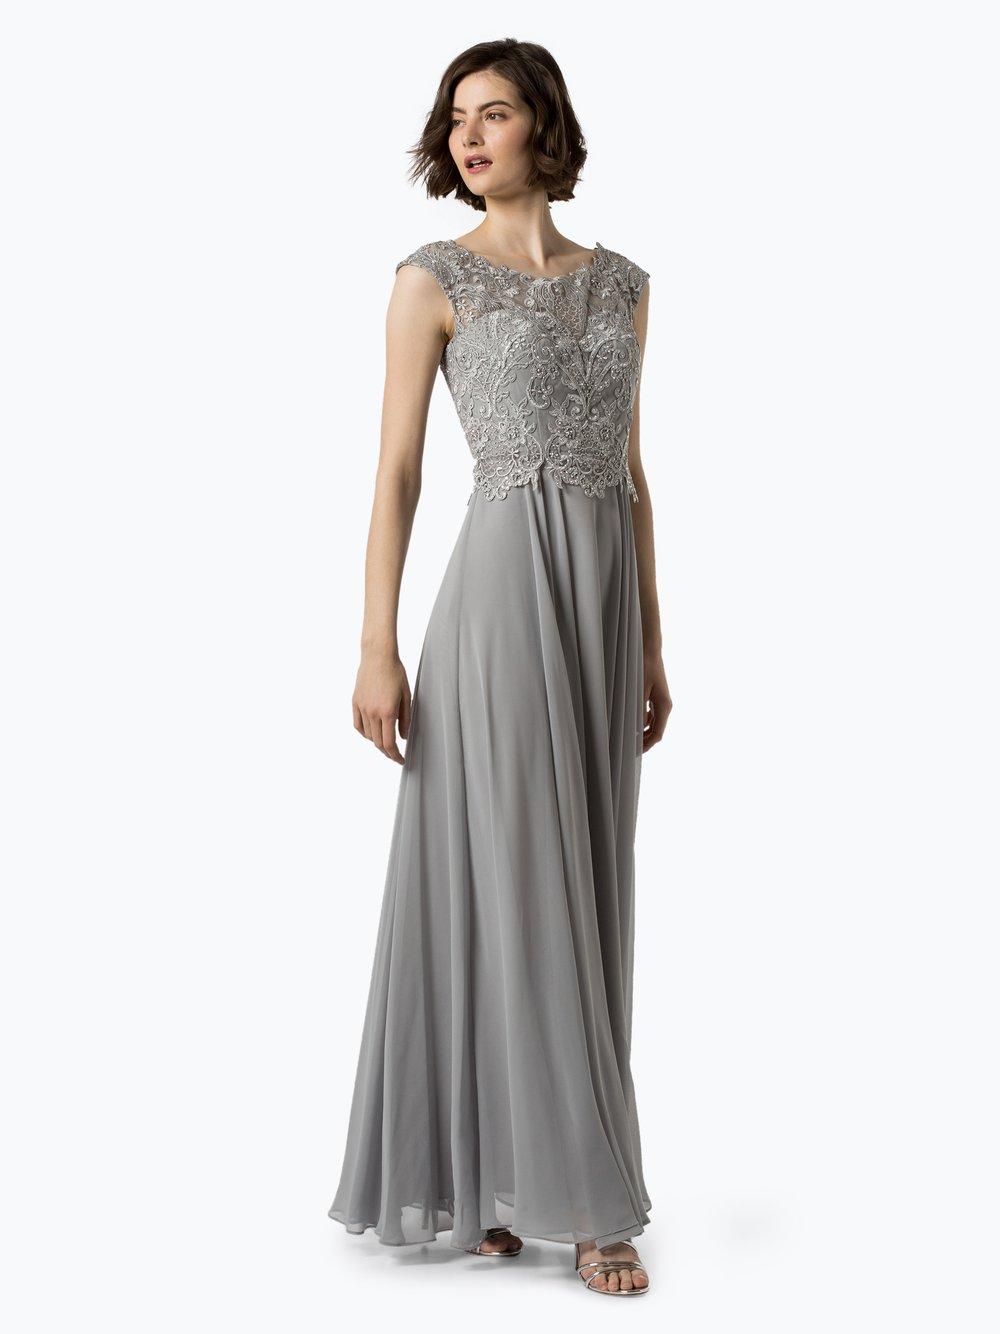 Luxuar Fashion – Damska sukienka wieczorowa, szary Van Graaf 441616-0001